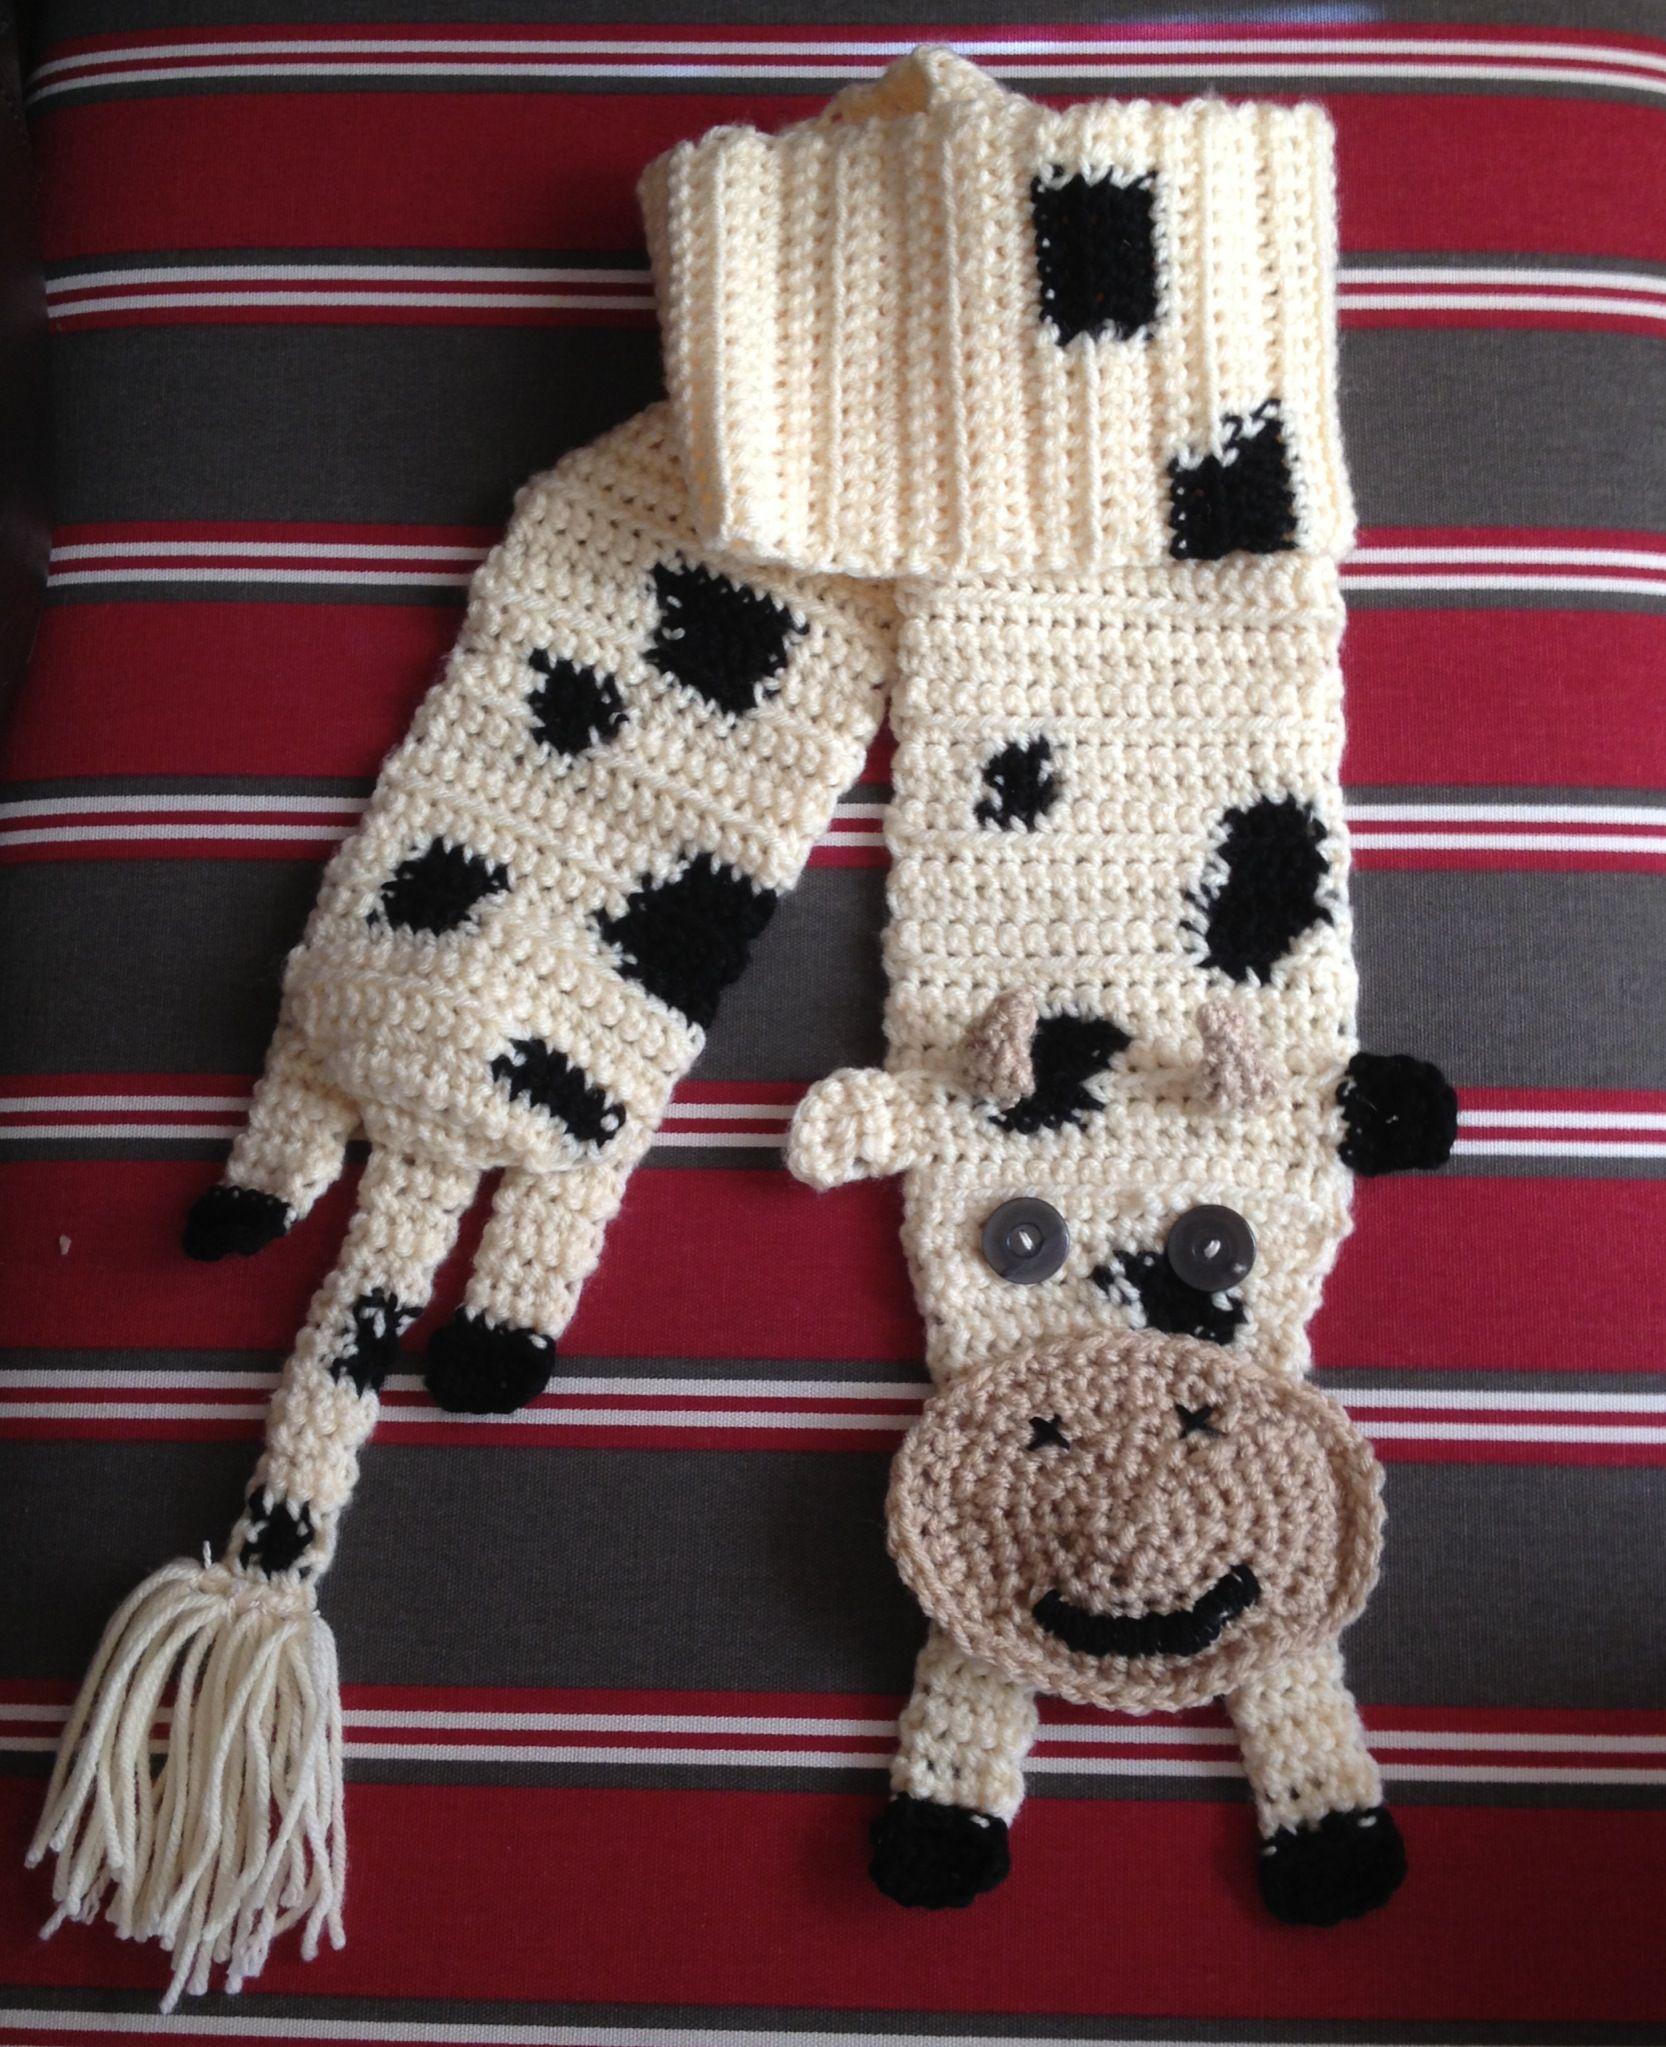 crocheted cow scarf crochetcow crochetscarf cowscarf bebek pinterest stricken und. Black Bedroom Furniture Sets. Home Design Ideas